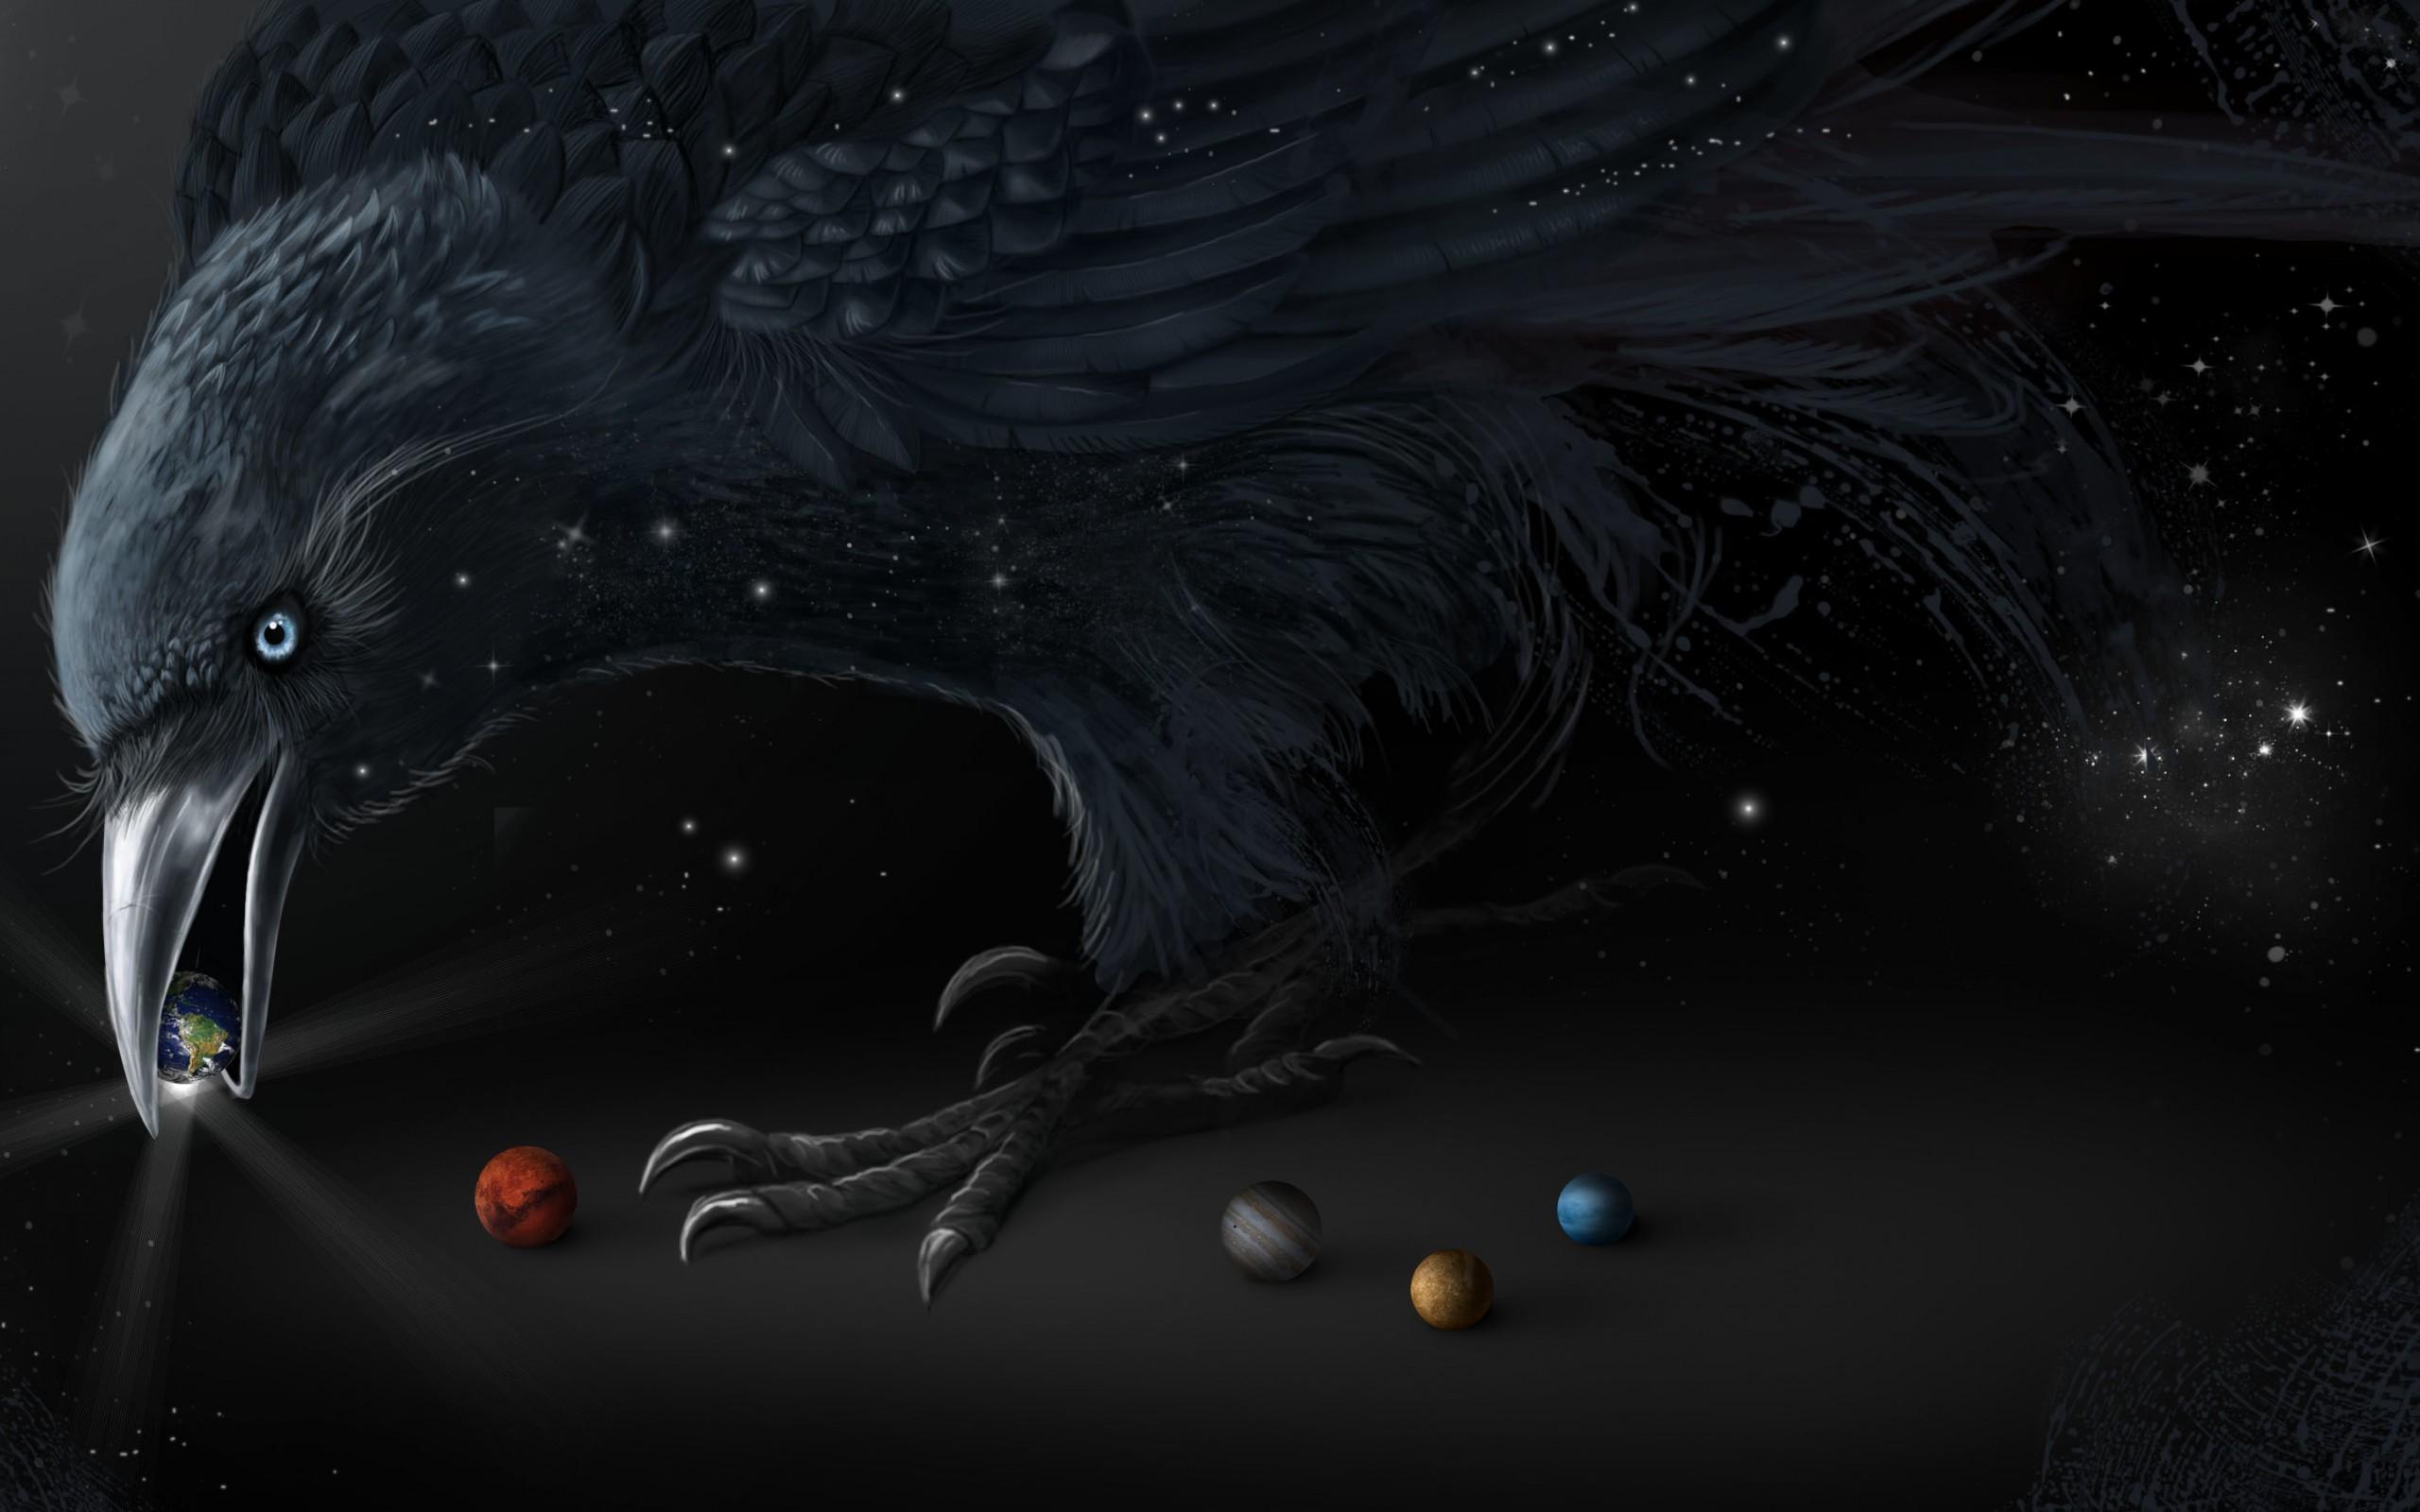 обои ворон, шарики, планеты, звезды картинки фото